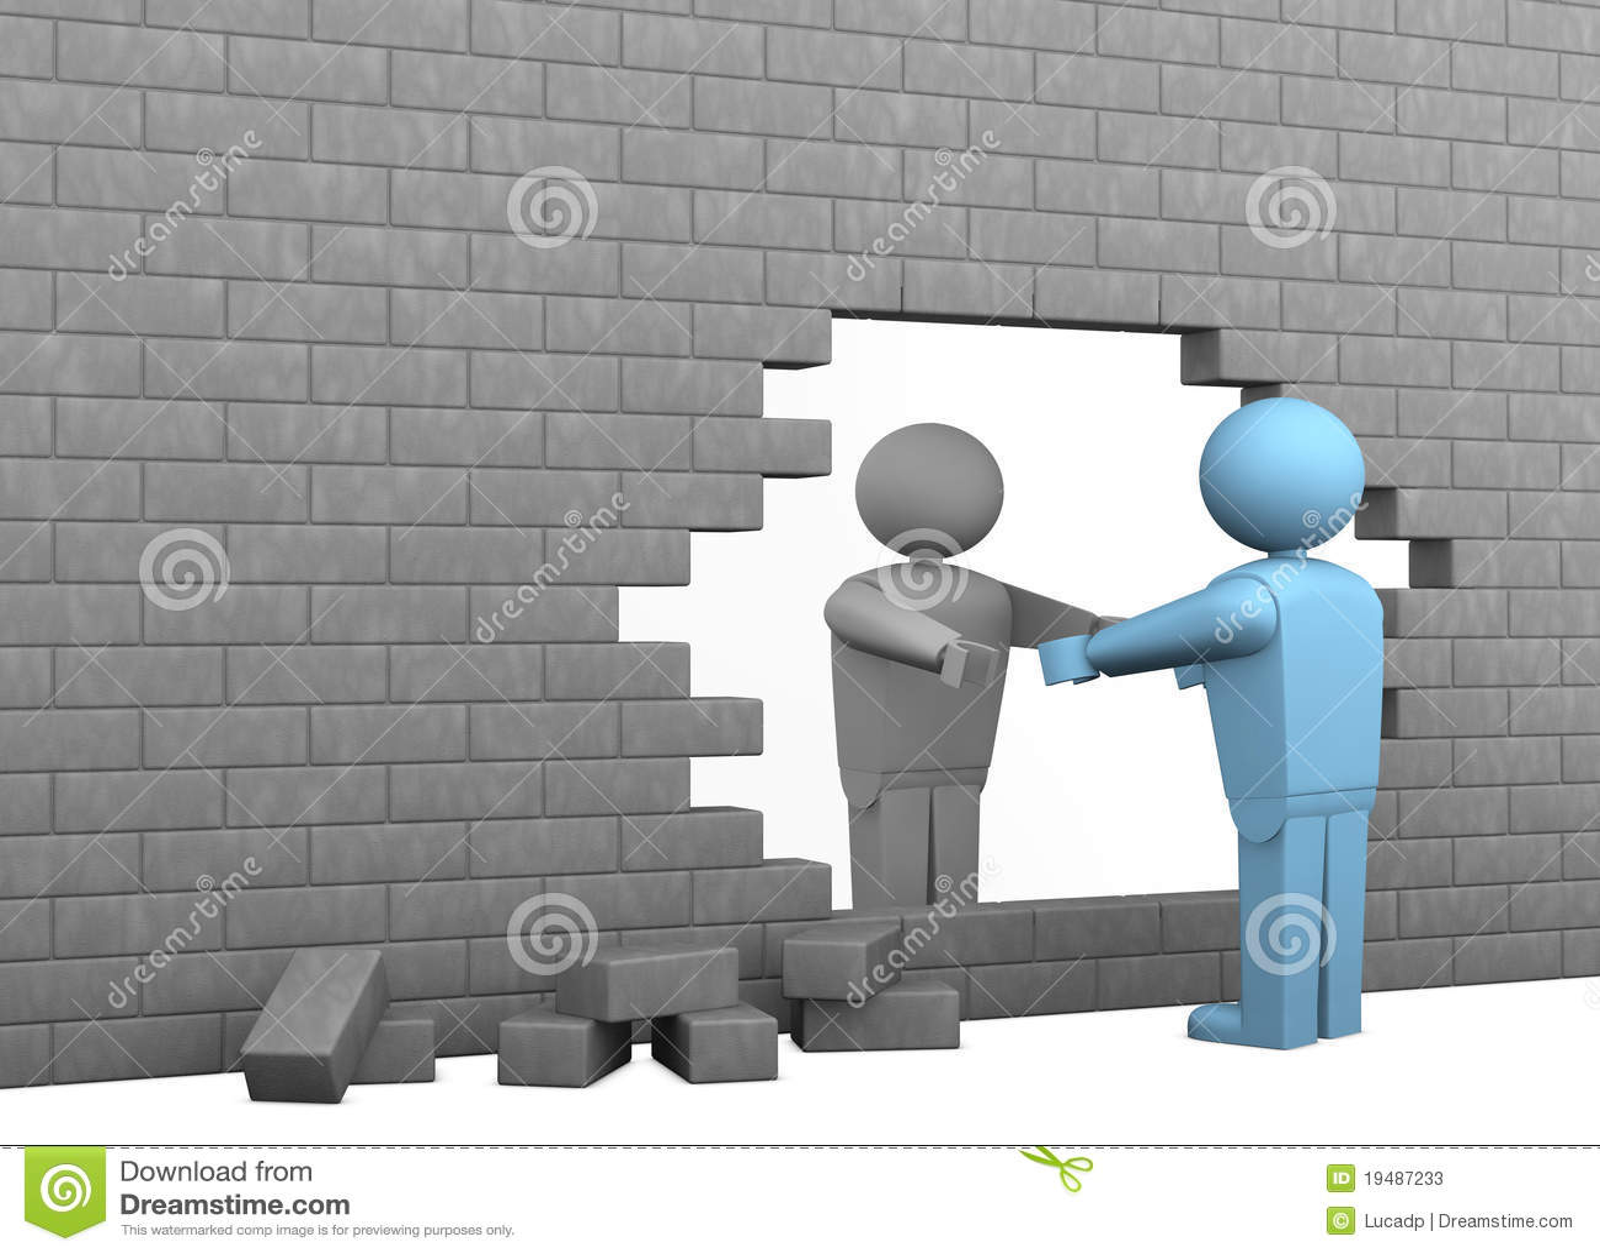 3d Brick Wallpaper For Walls Break Down Barriers Stock Illustration Illustration Of